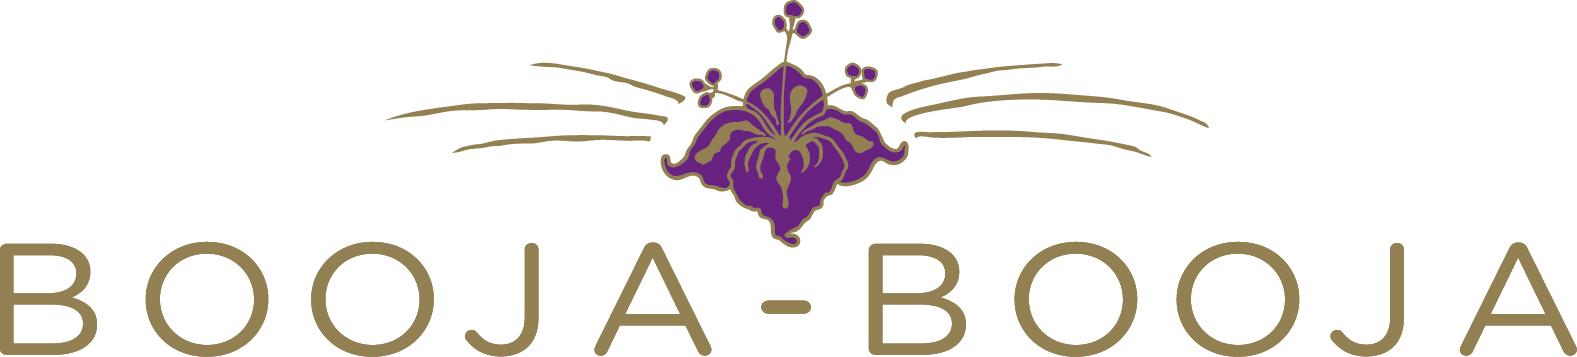 booja-booja-logo